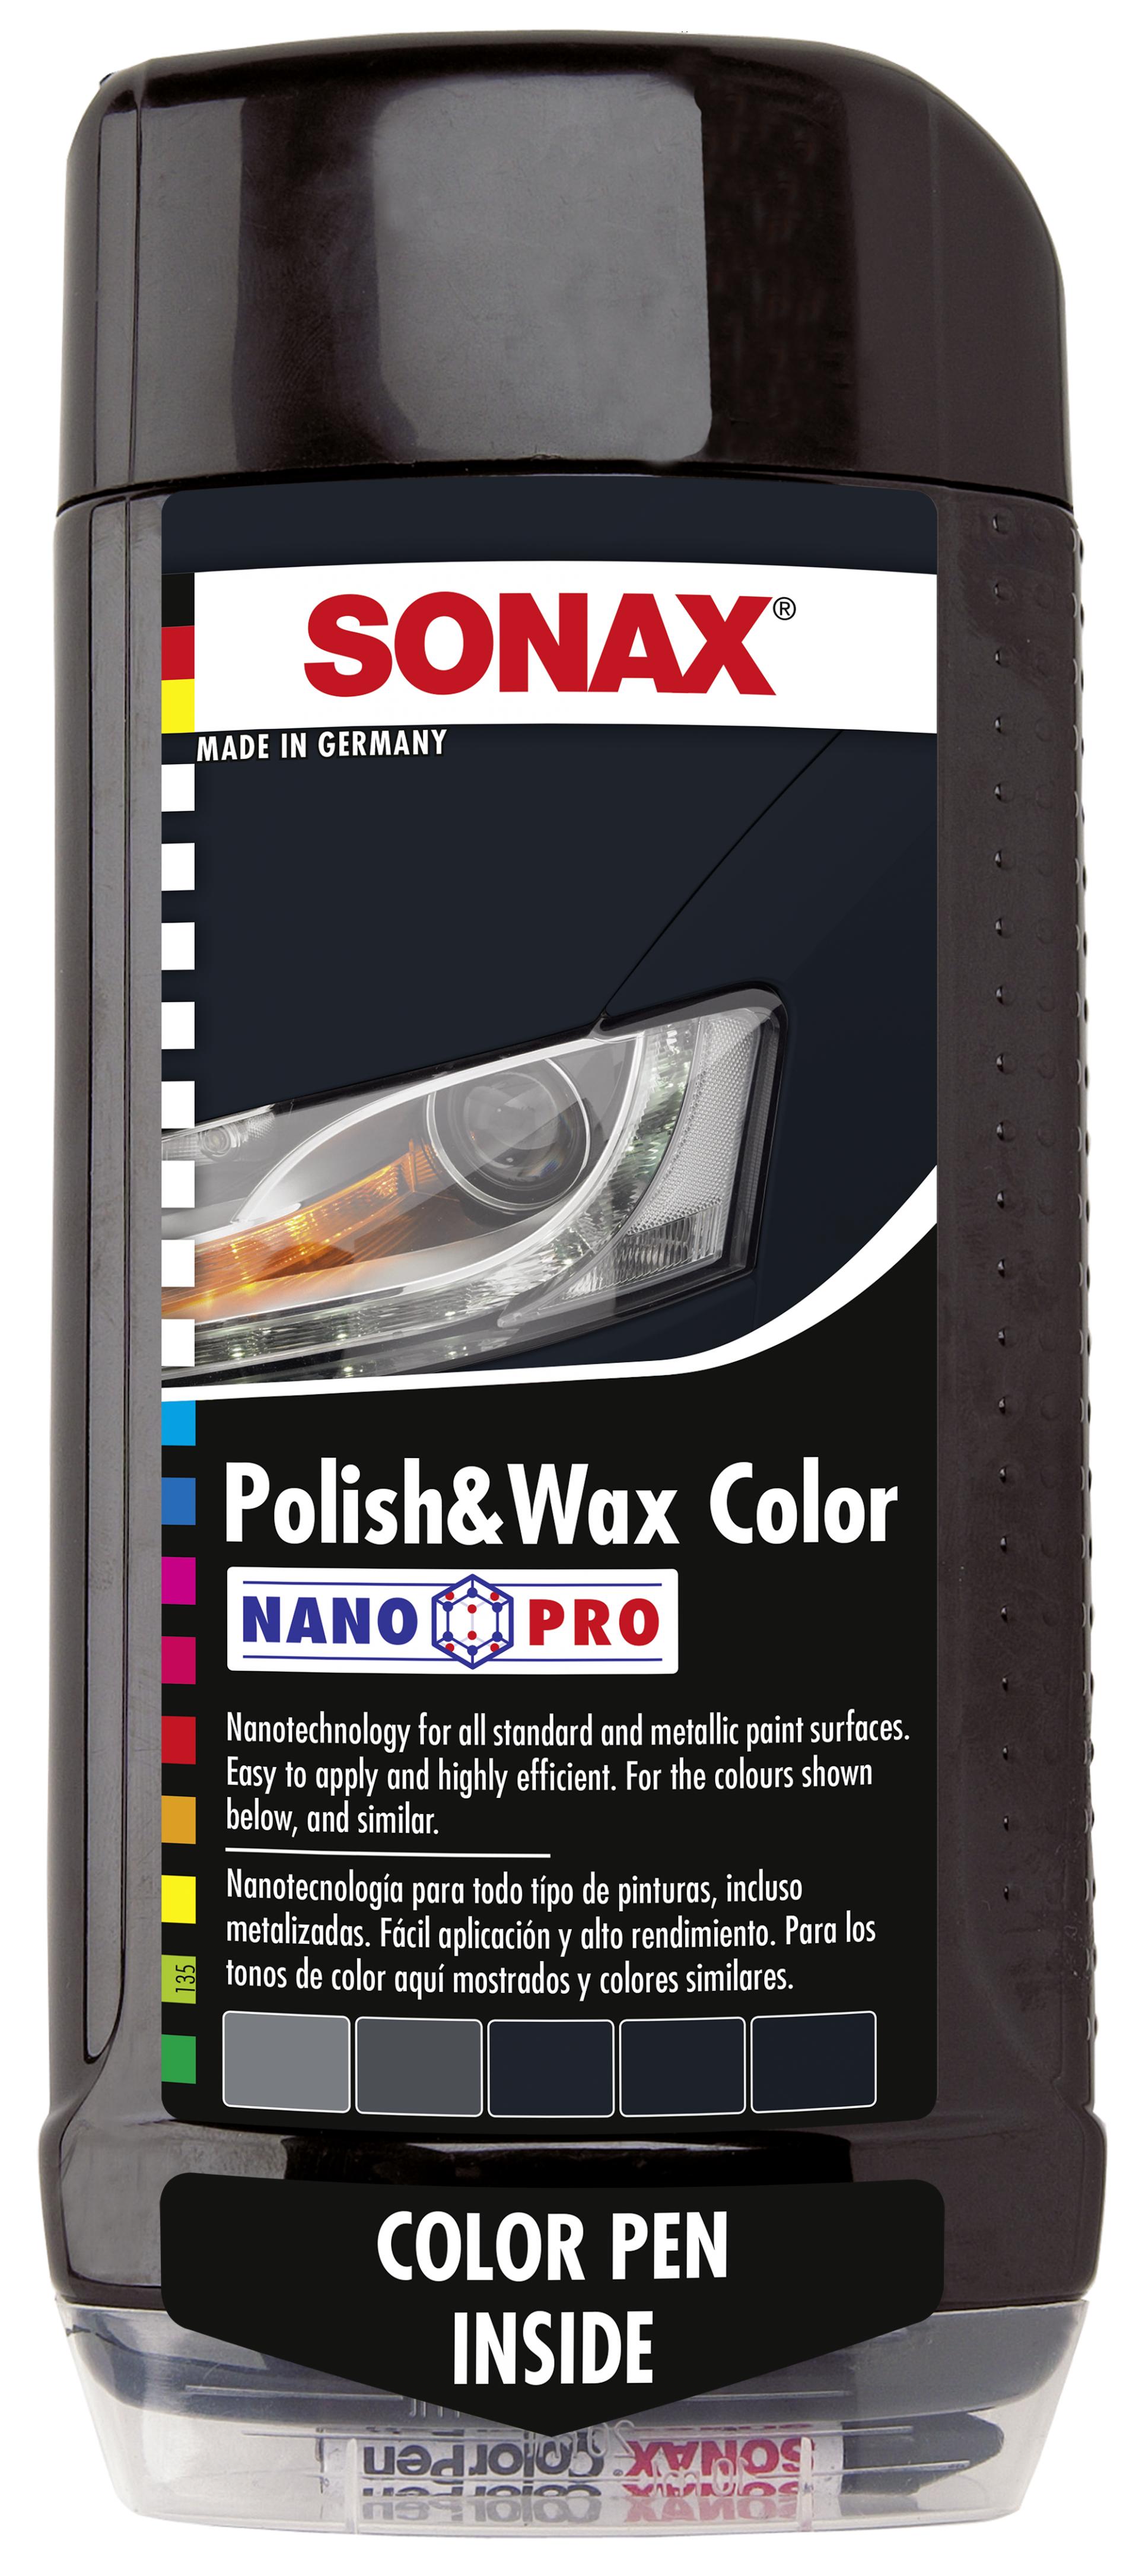 SONAX Polish & wax color NanoPro